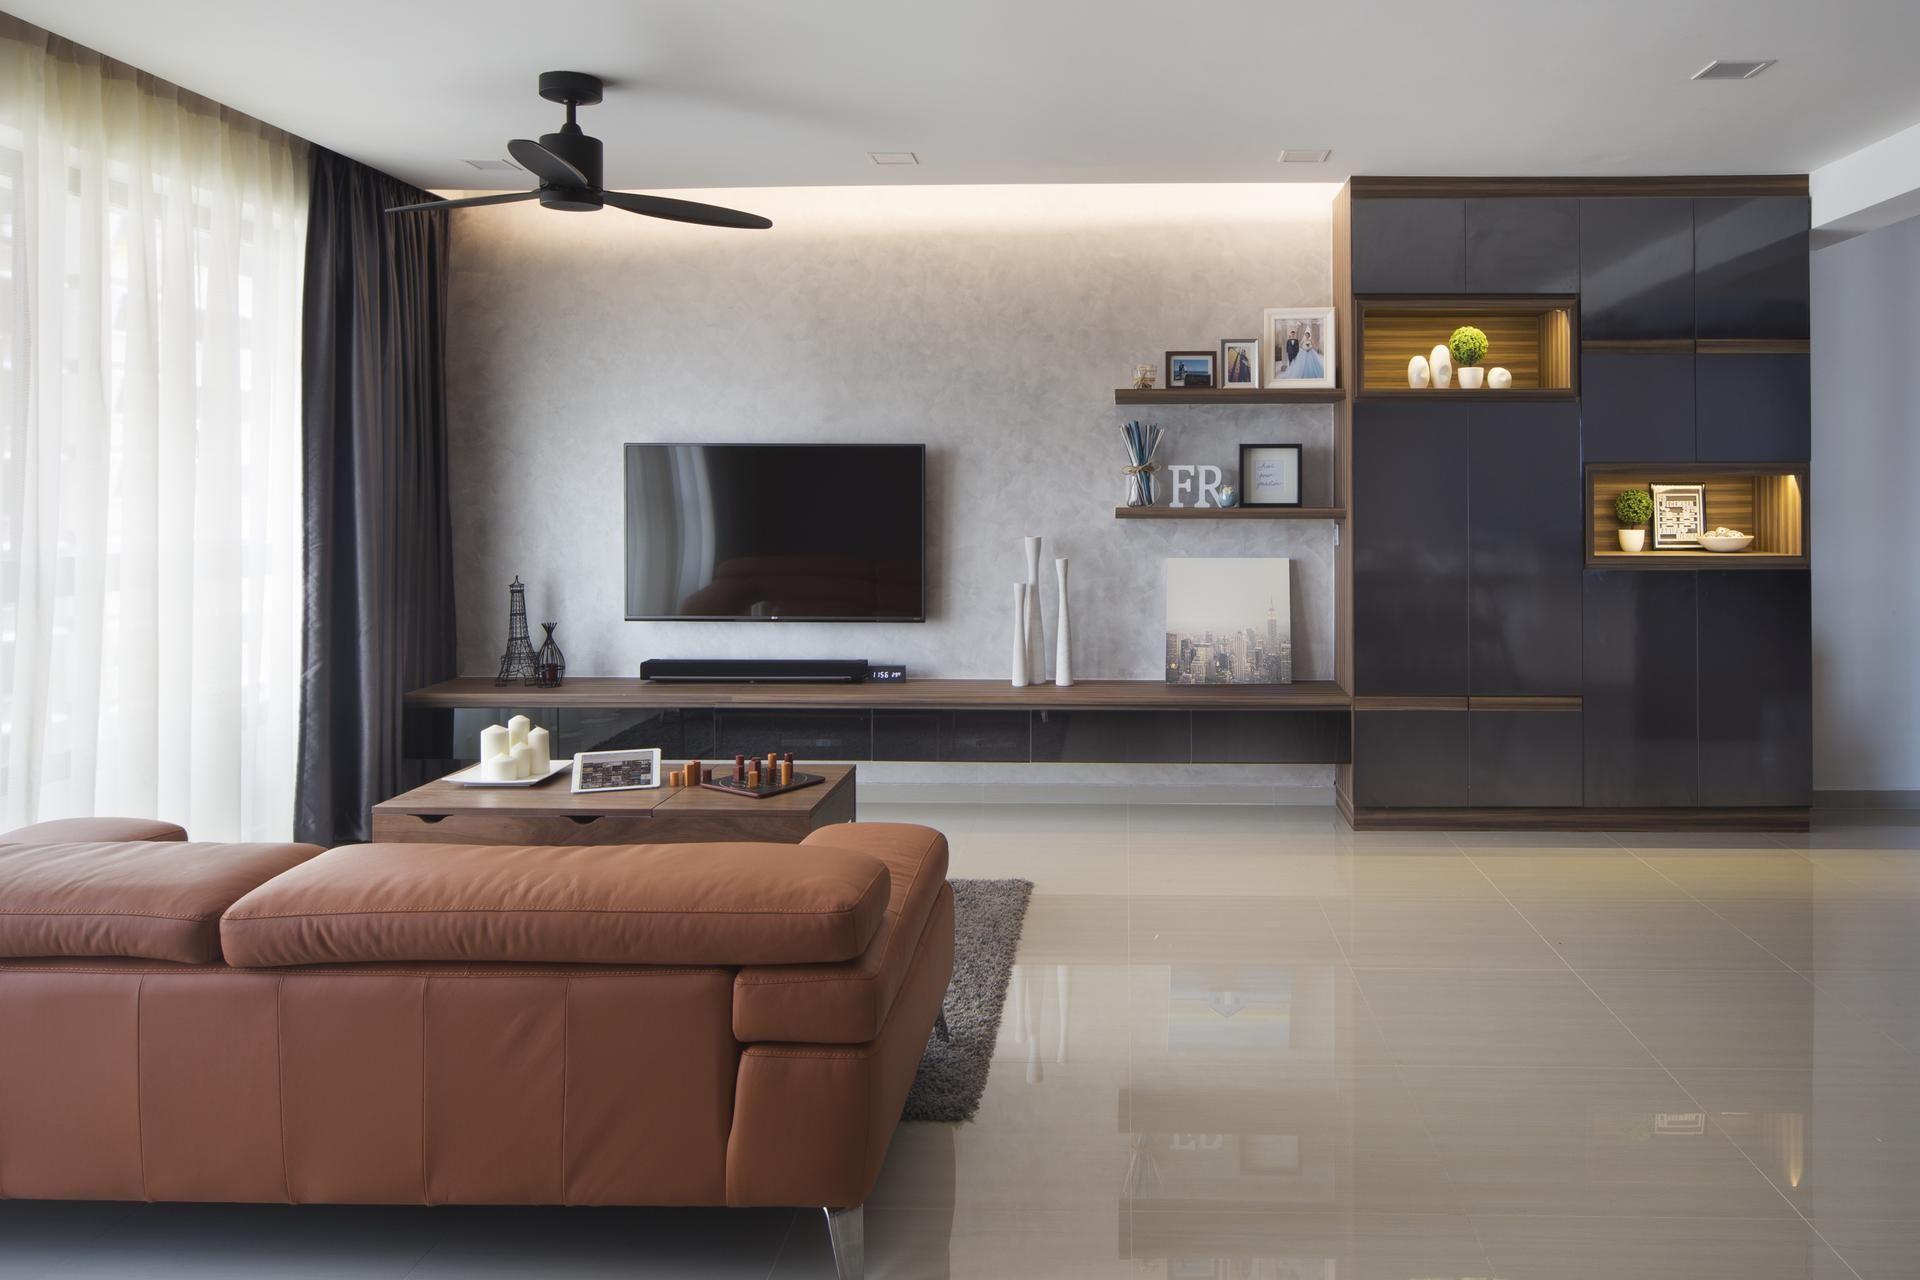 Compassvale Crescent (Block 293D)   Qanvast   Home Design, Renovation,  Remodelling